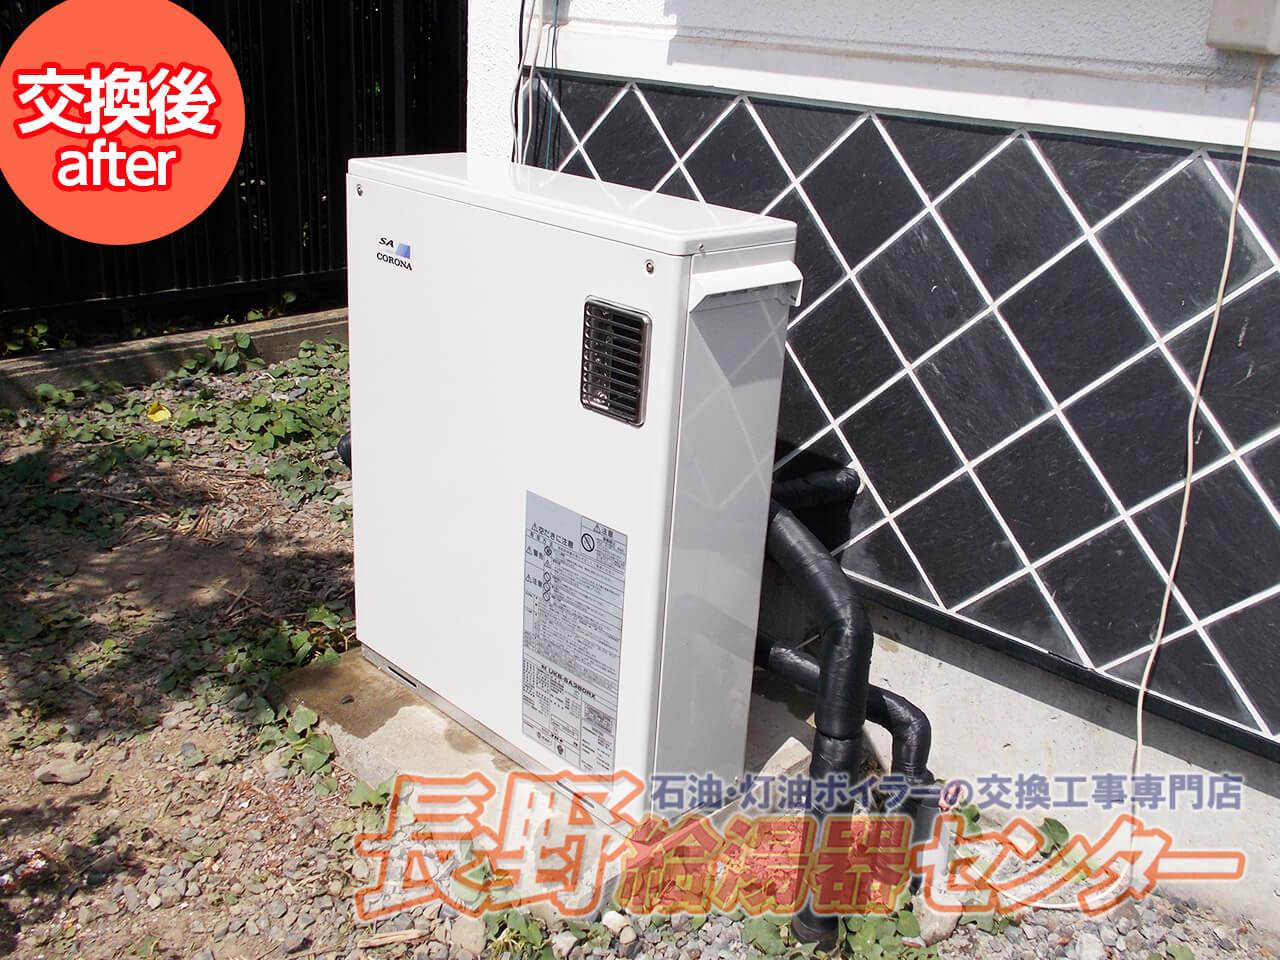 飯田市 RUX-1000UWFK(a)からRUX-A1611W-Eへ交換工事